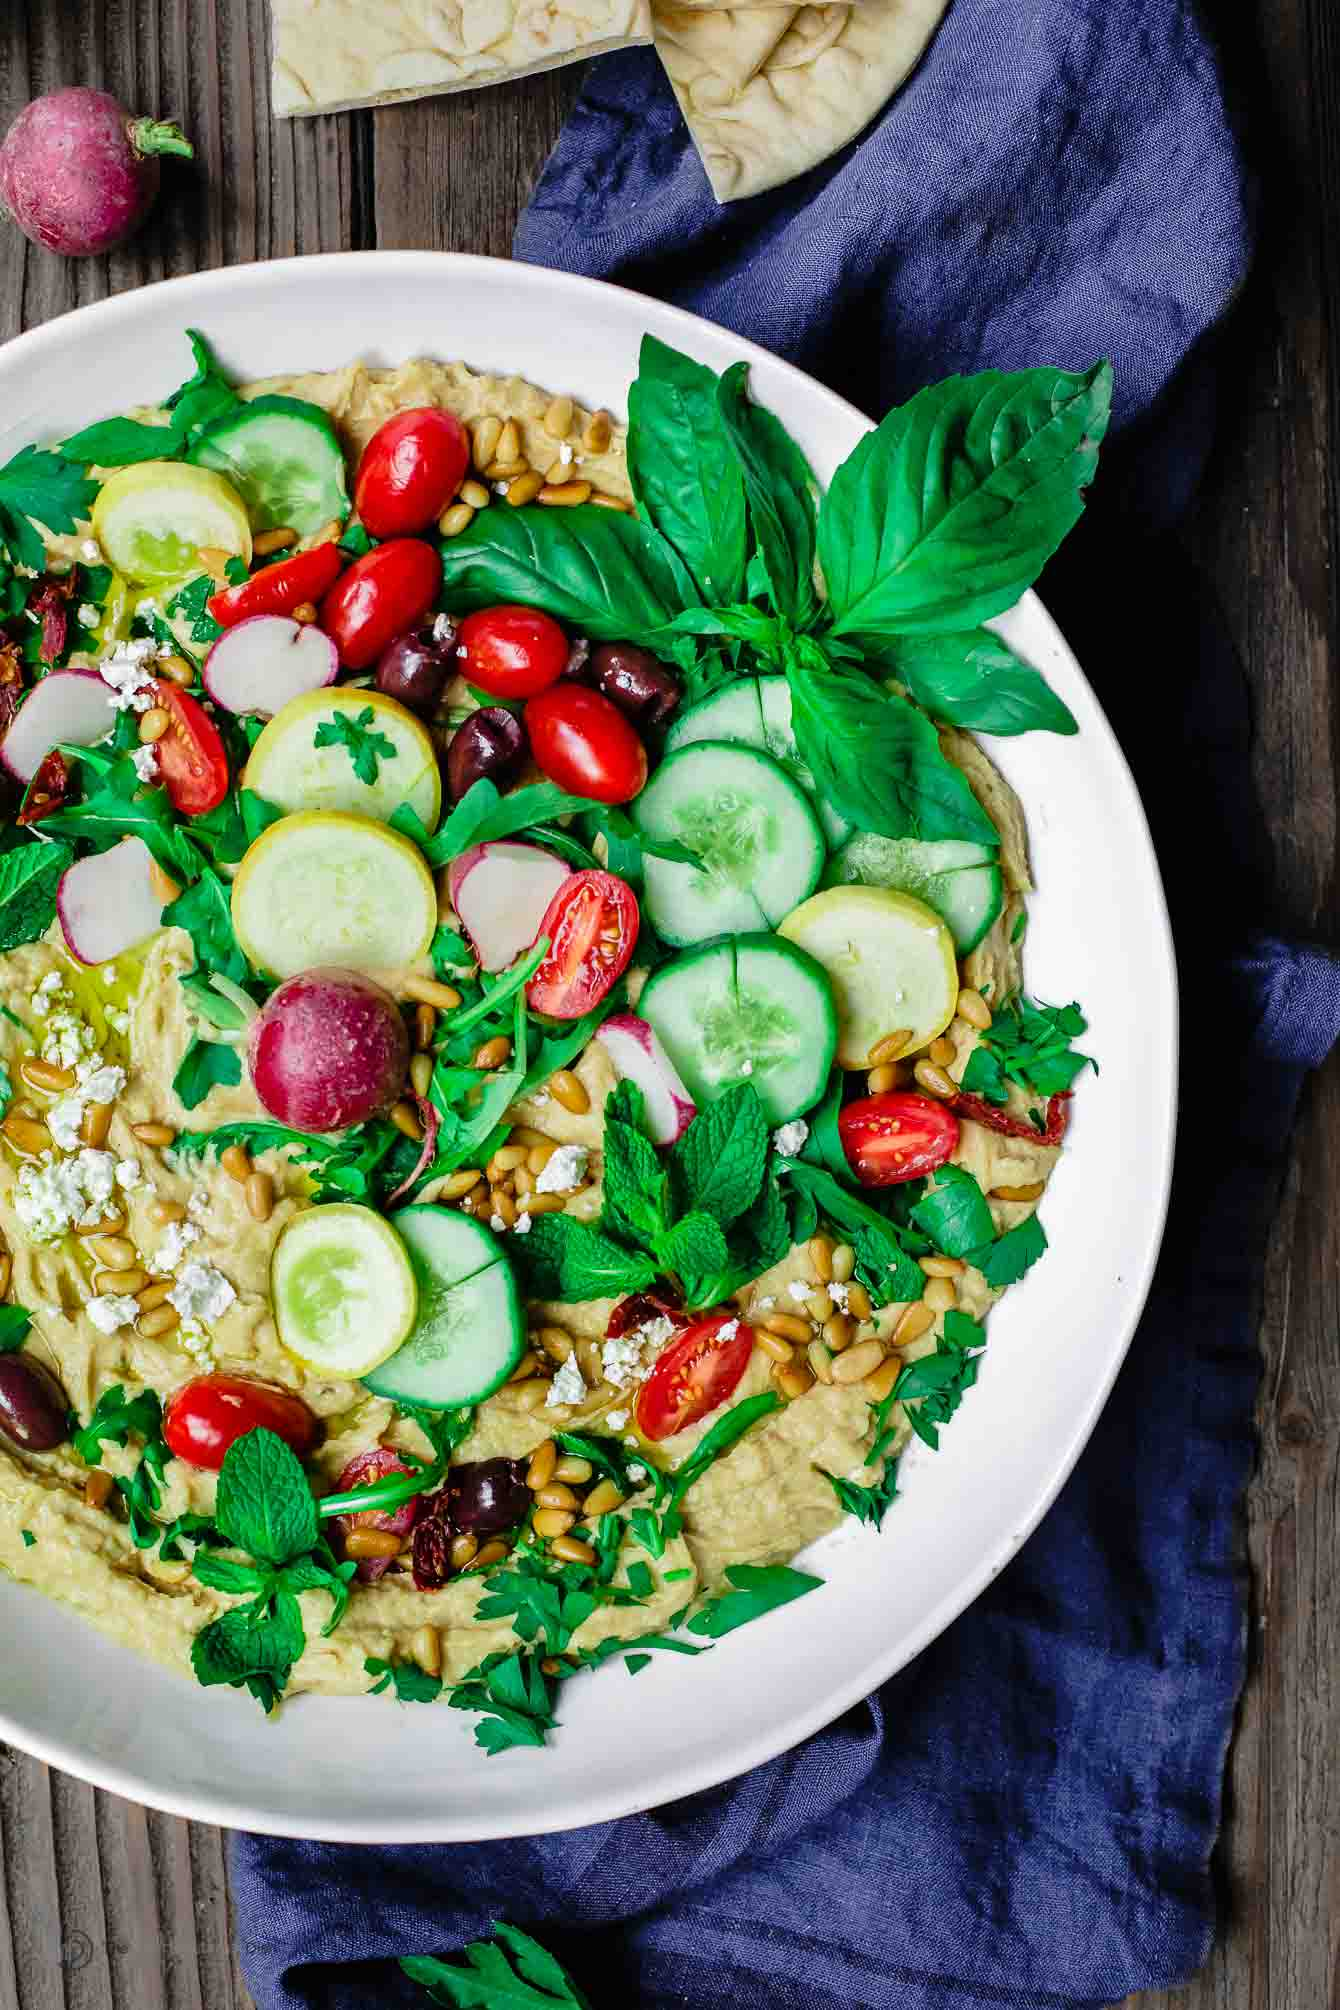 Bowl of Mediterranean Farmer's Market Hummus Dip